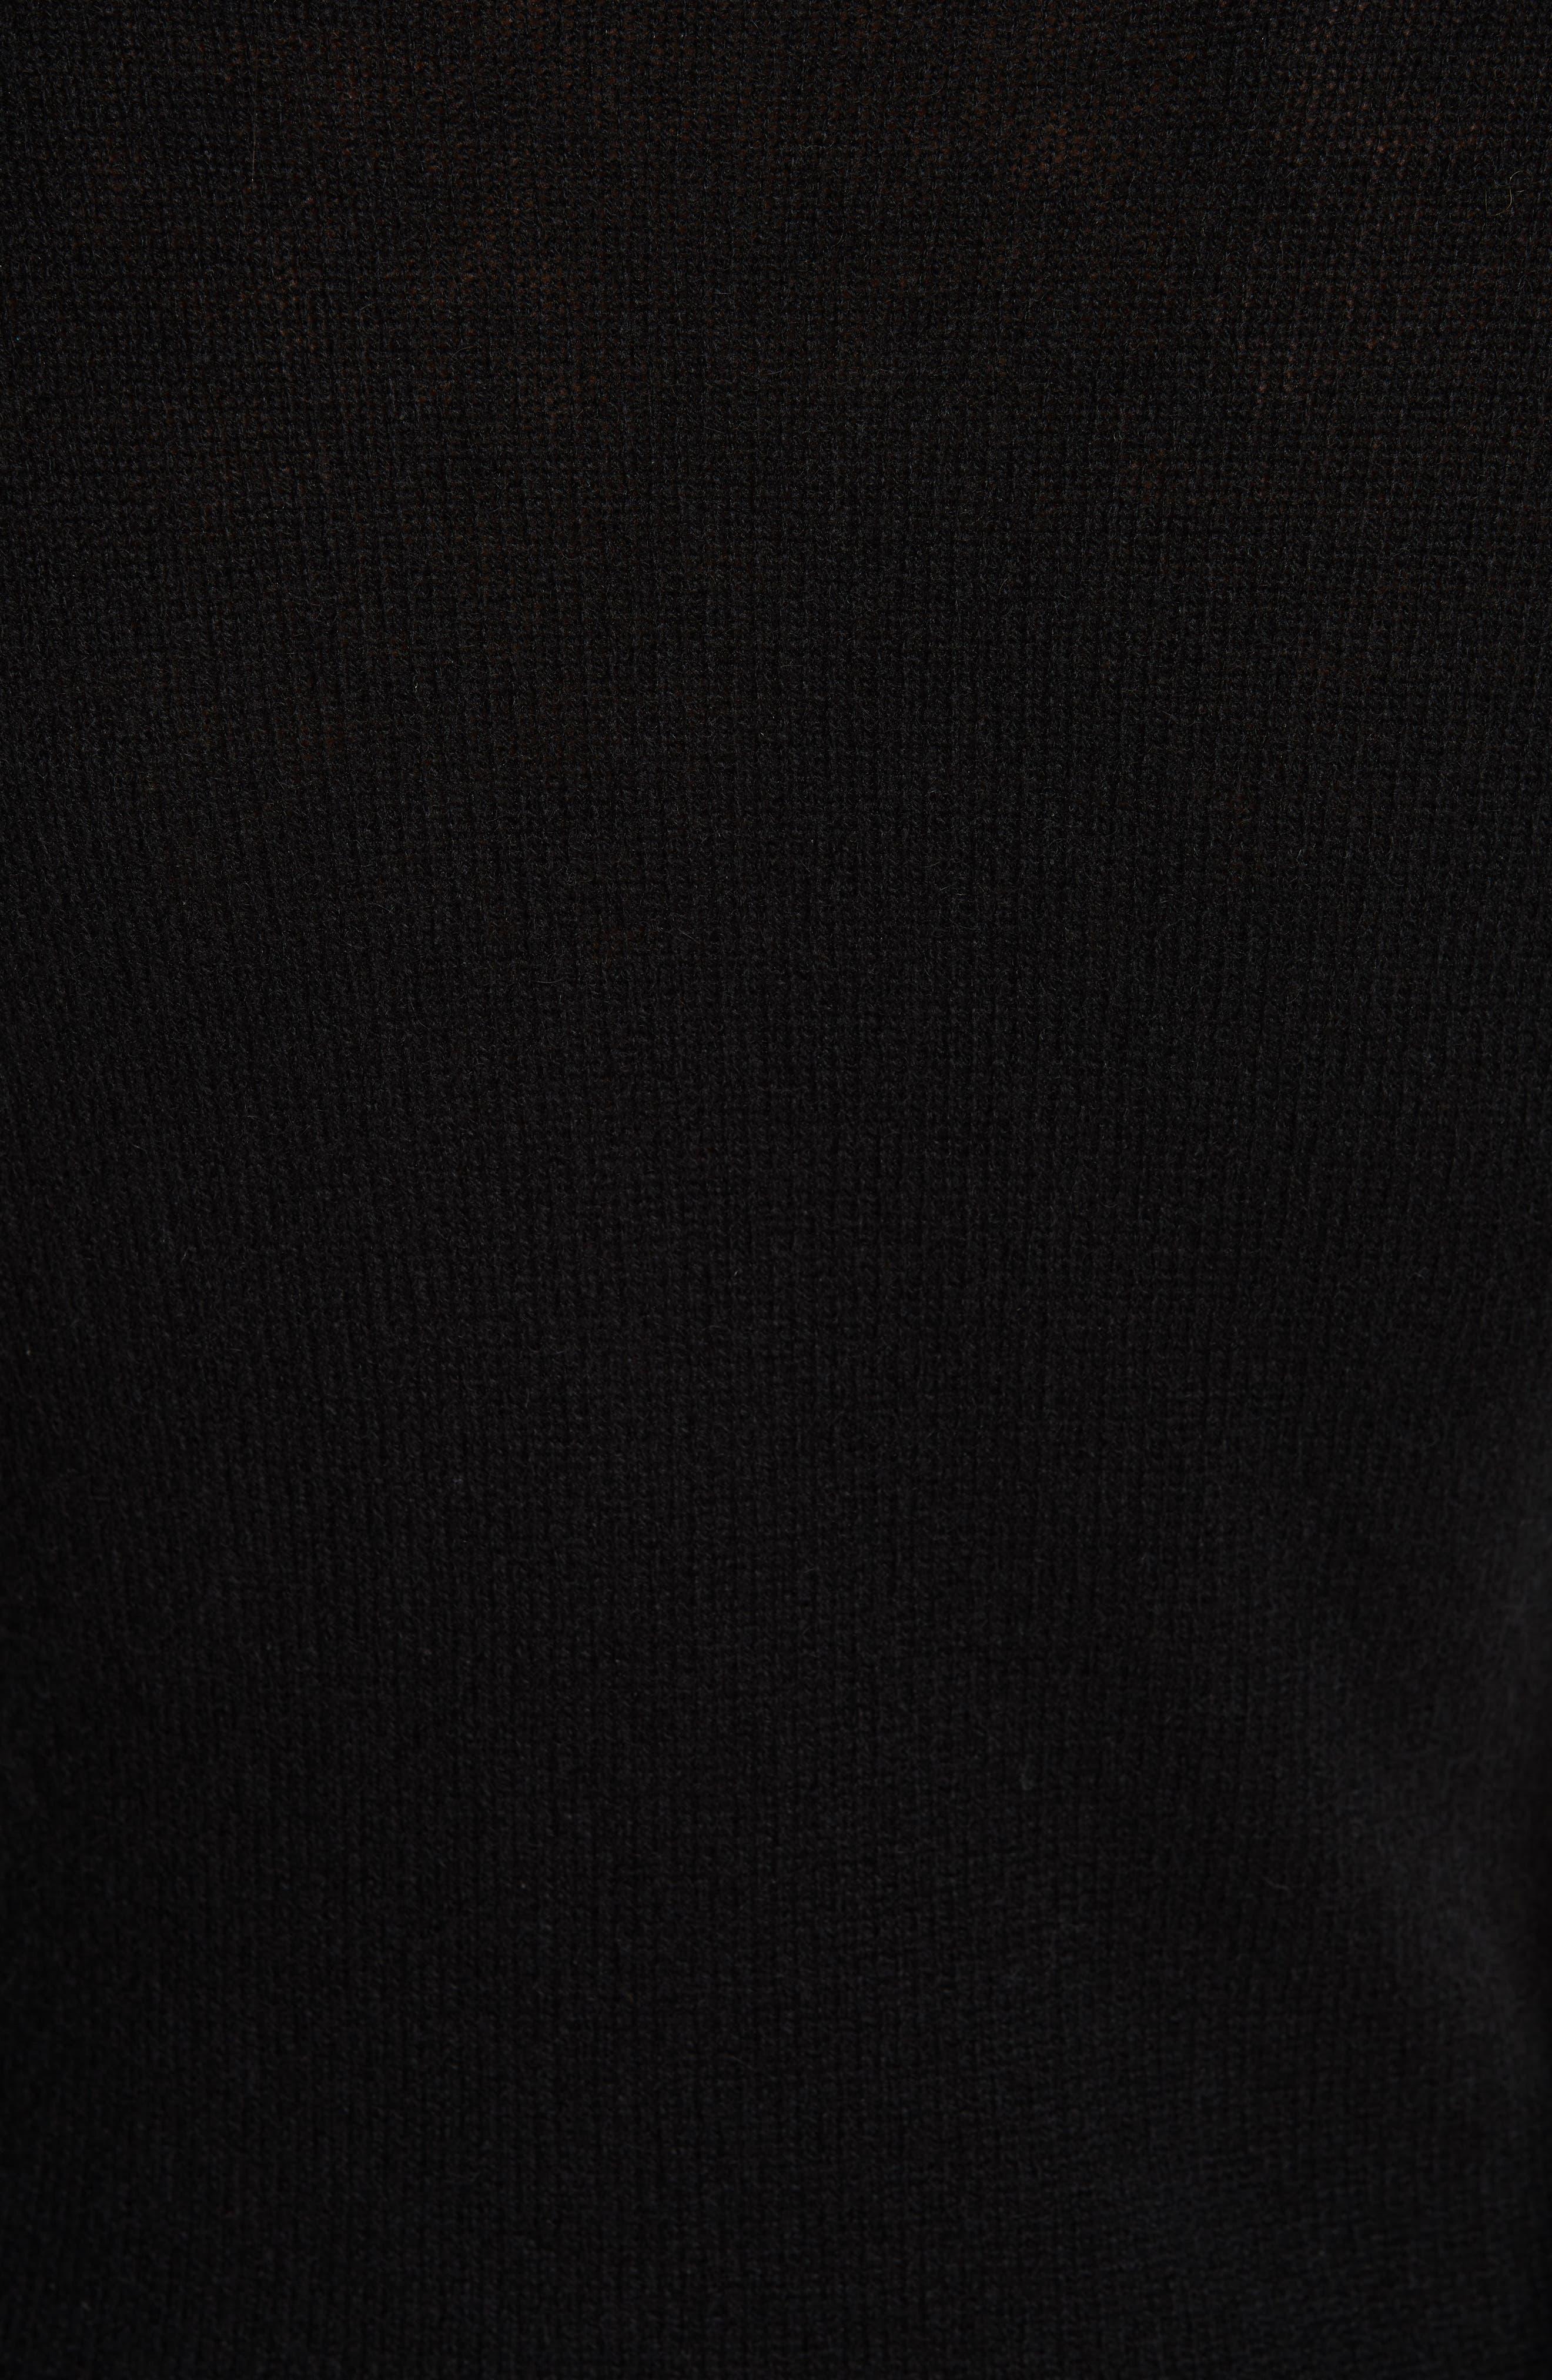 R13,                             Distressed Cashmere Turtleneck Sweater,                             Alternate thumbnail 5, color,                             001